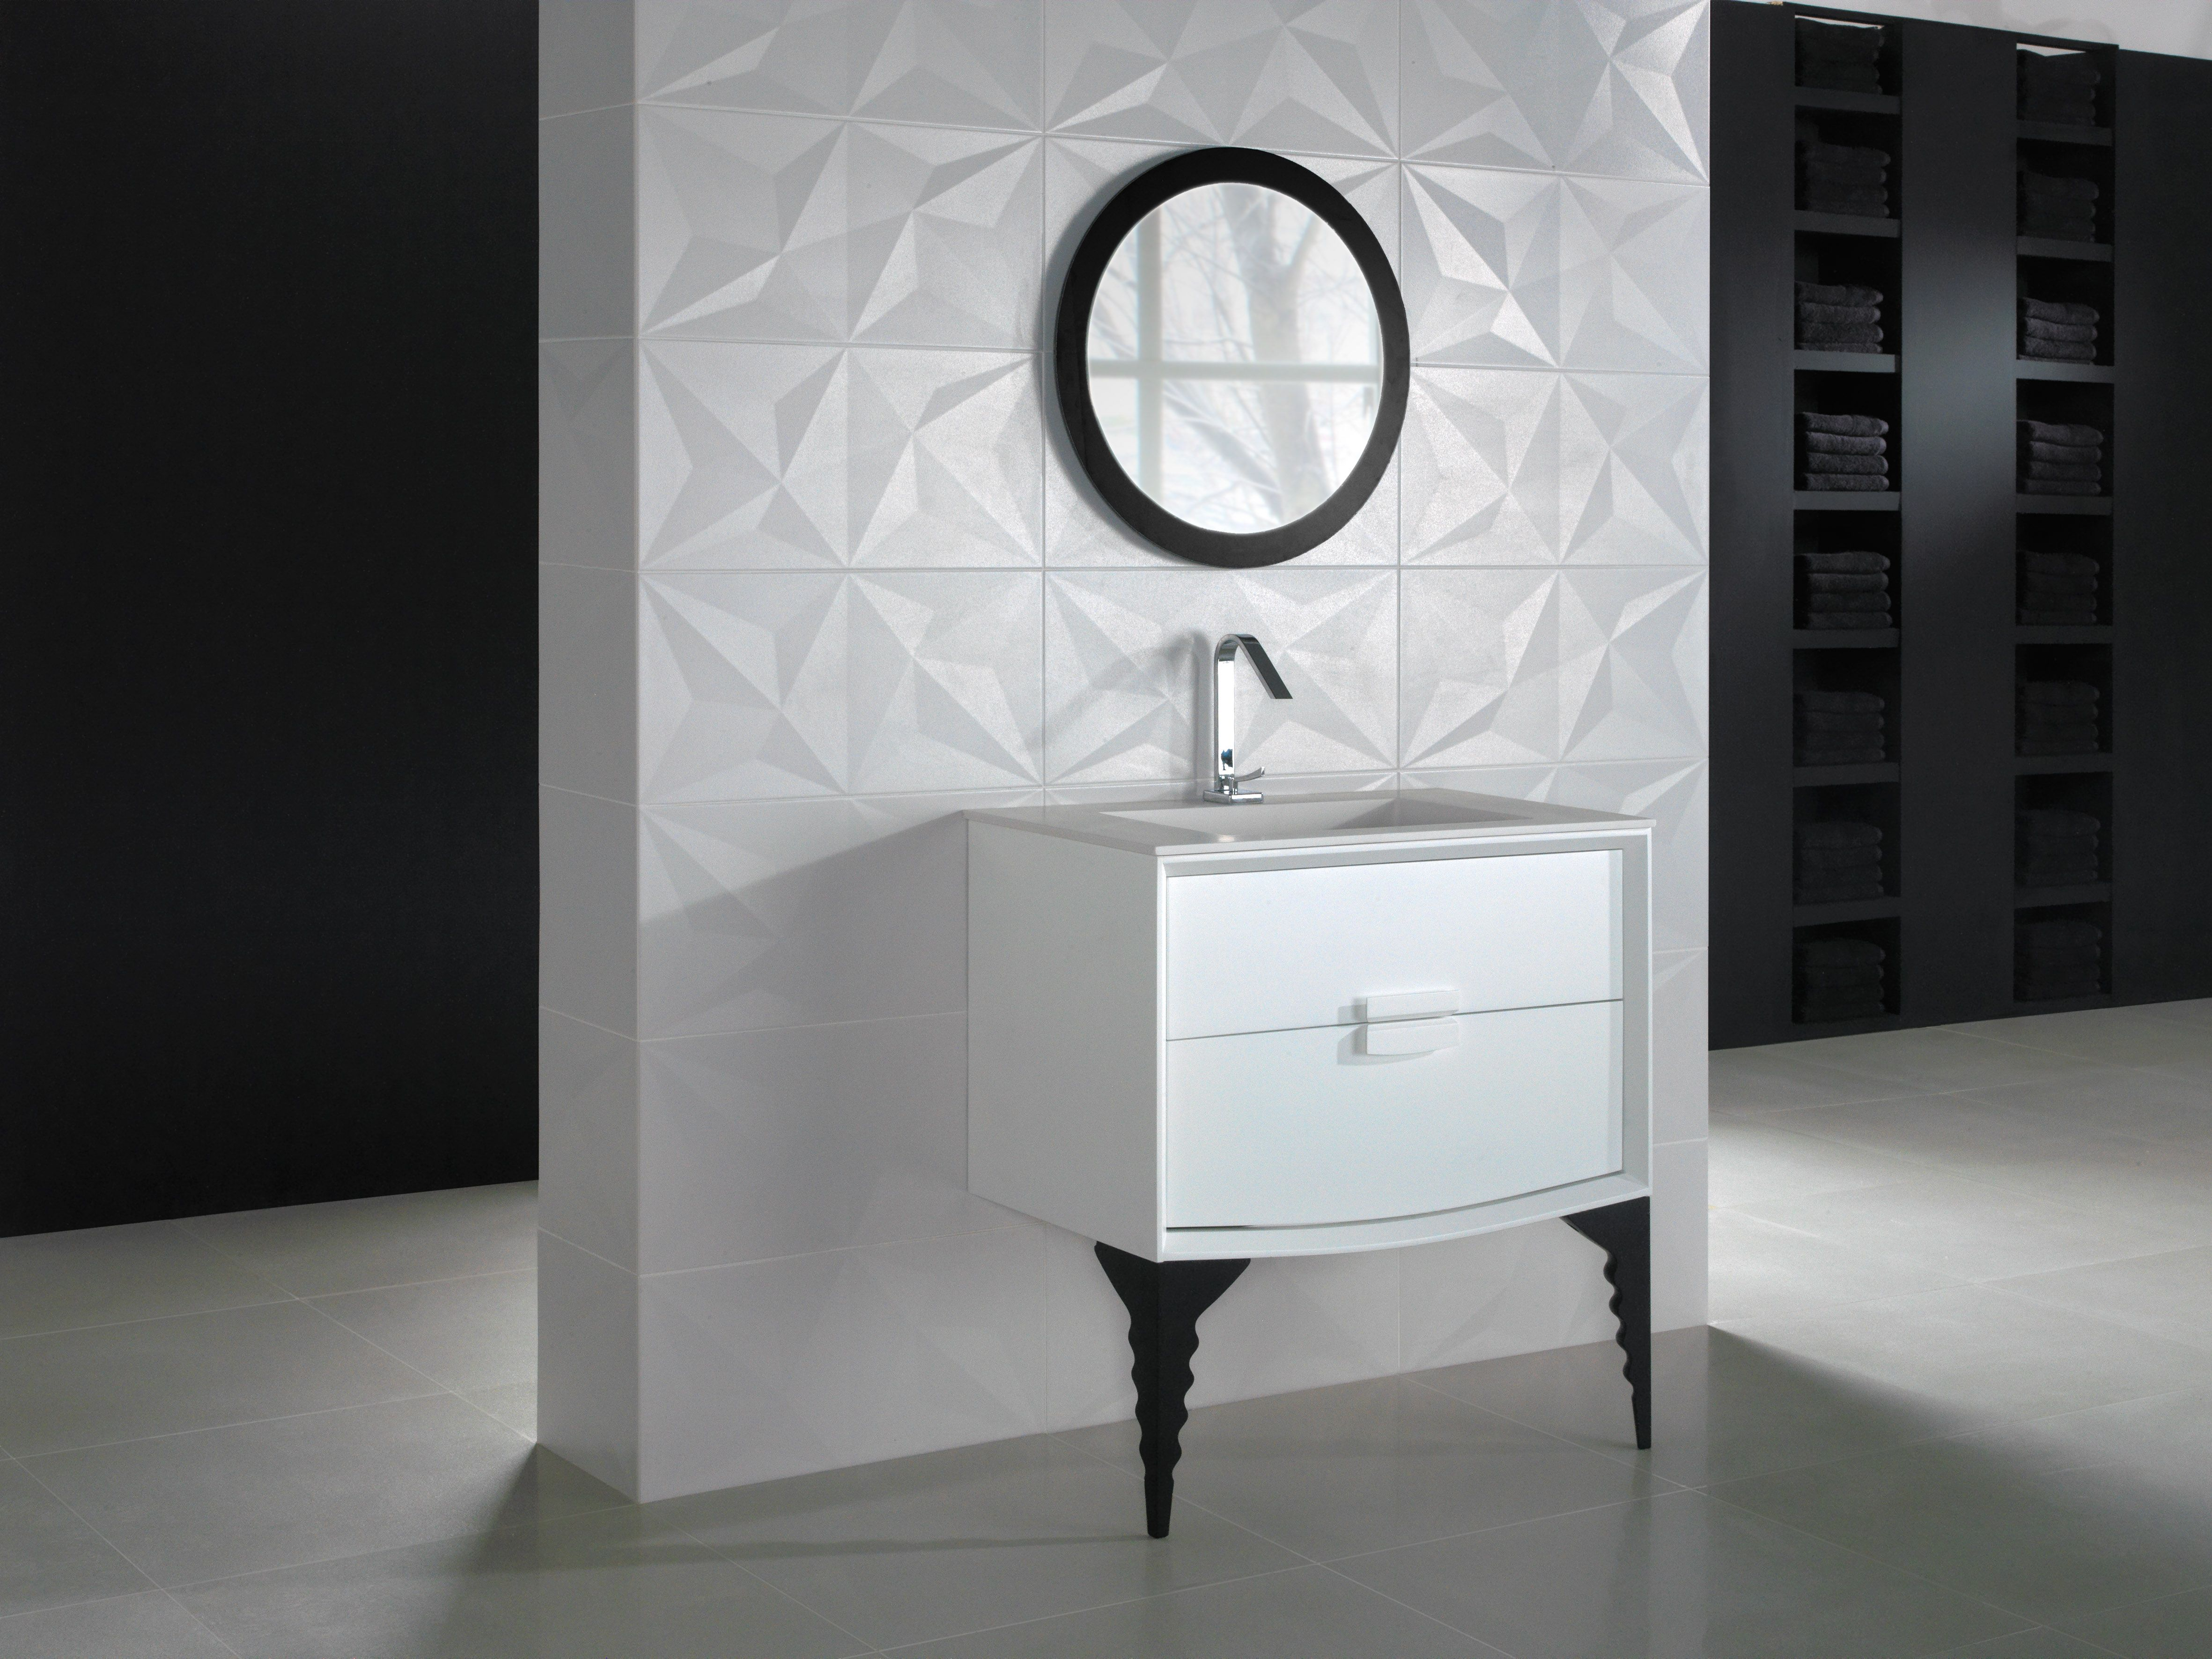 Gallery Blanco With Patas 4 Feet And Mirror Serie Grespania Bathroom